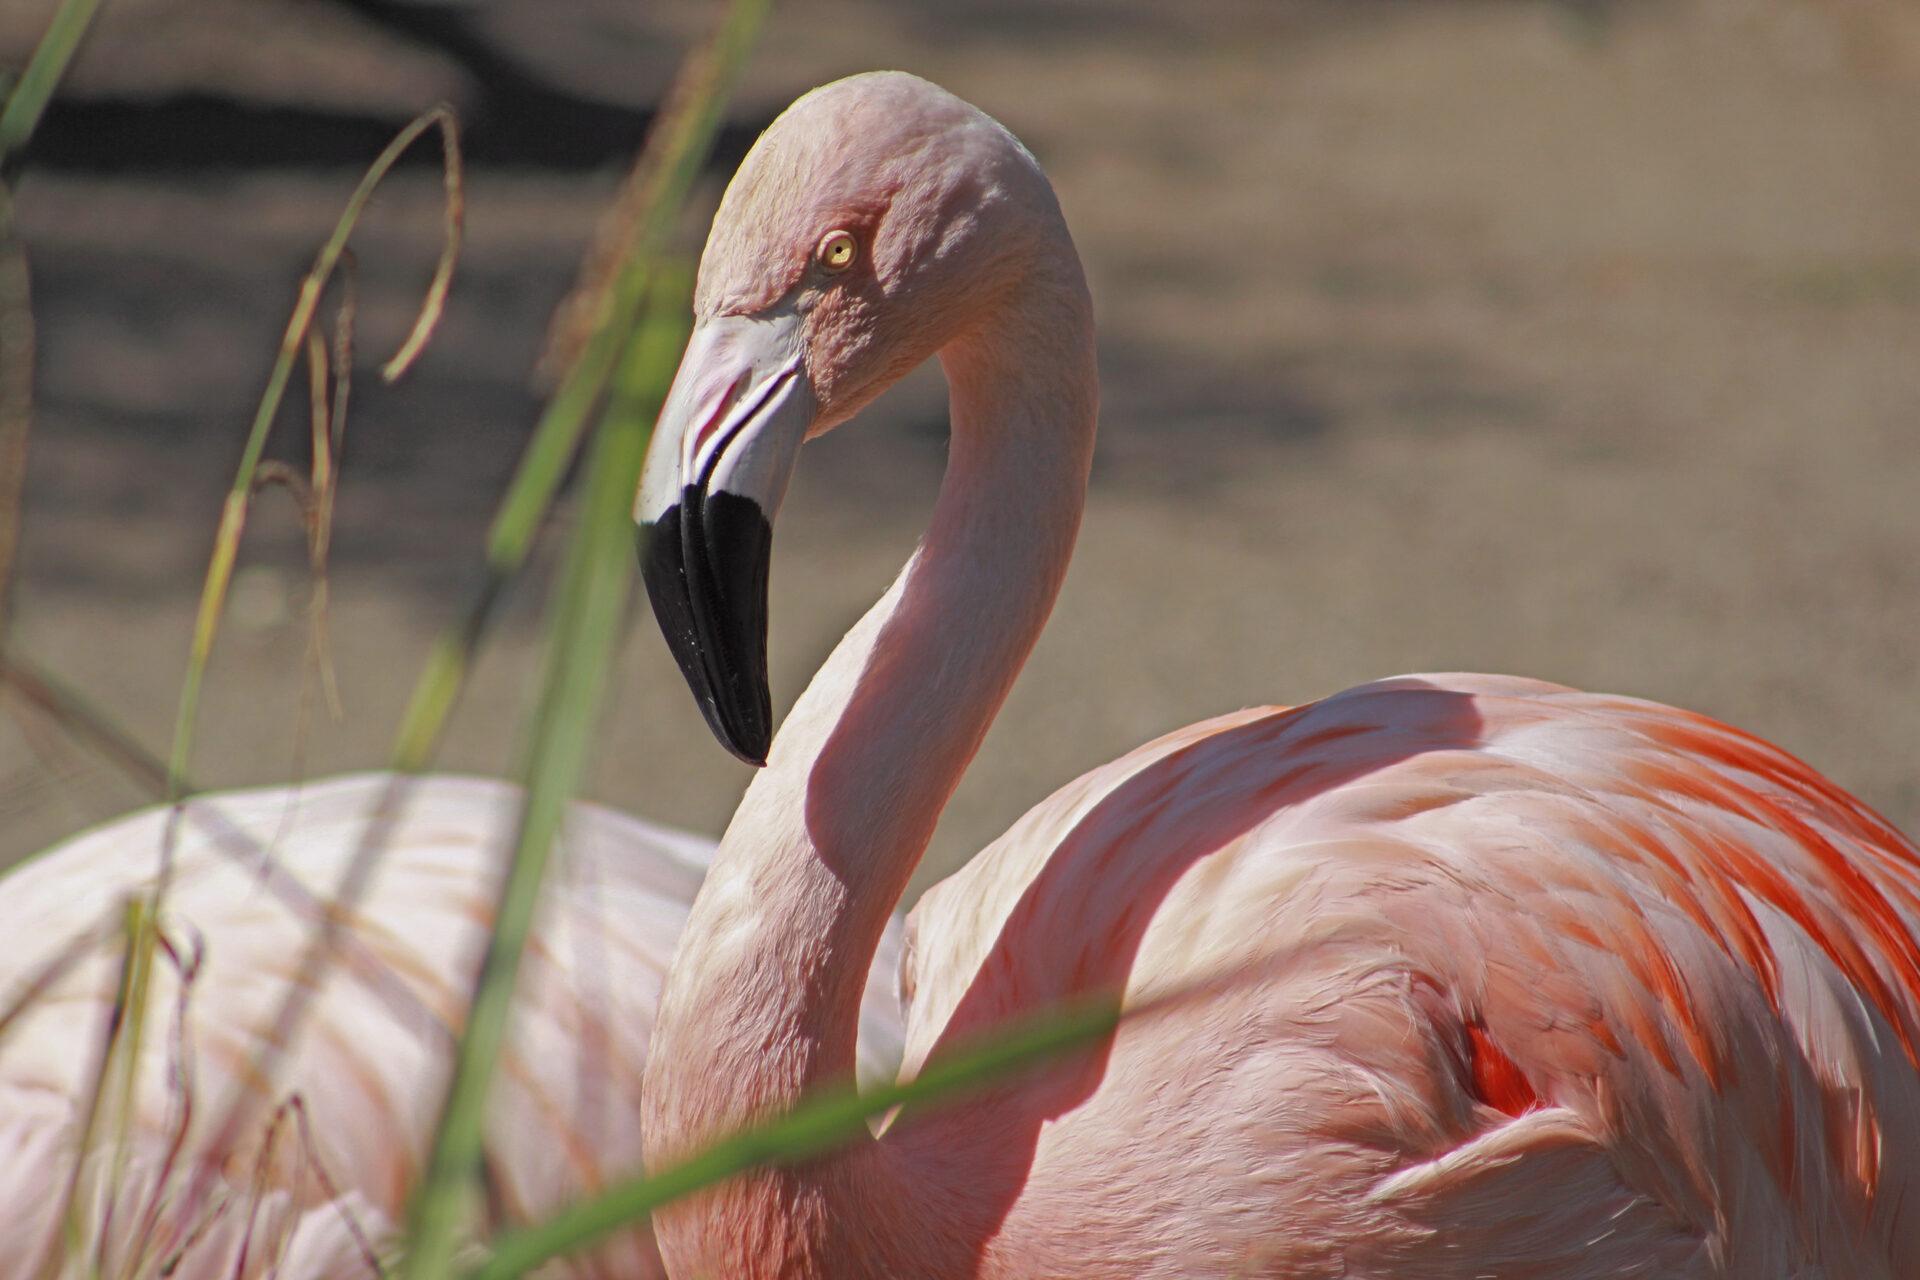 Chilean Flamingo, Woodland Park Zoo, July 16, 2021